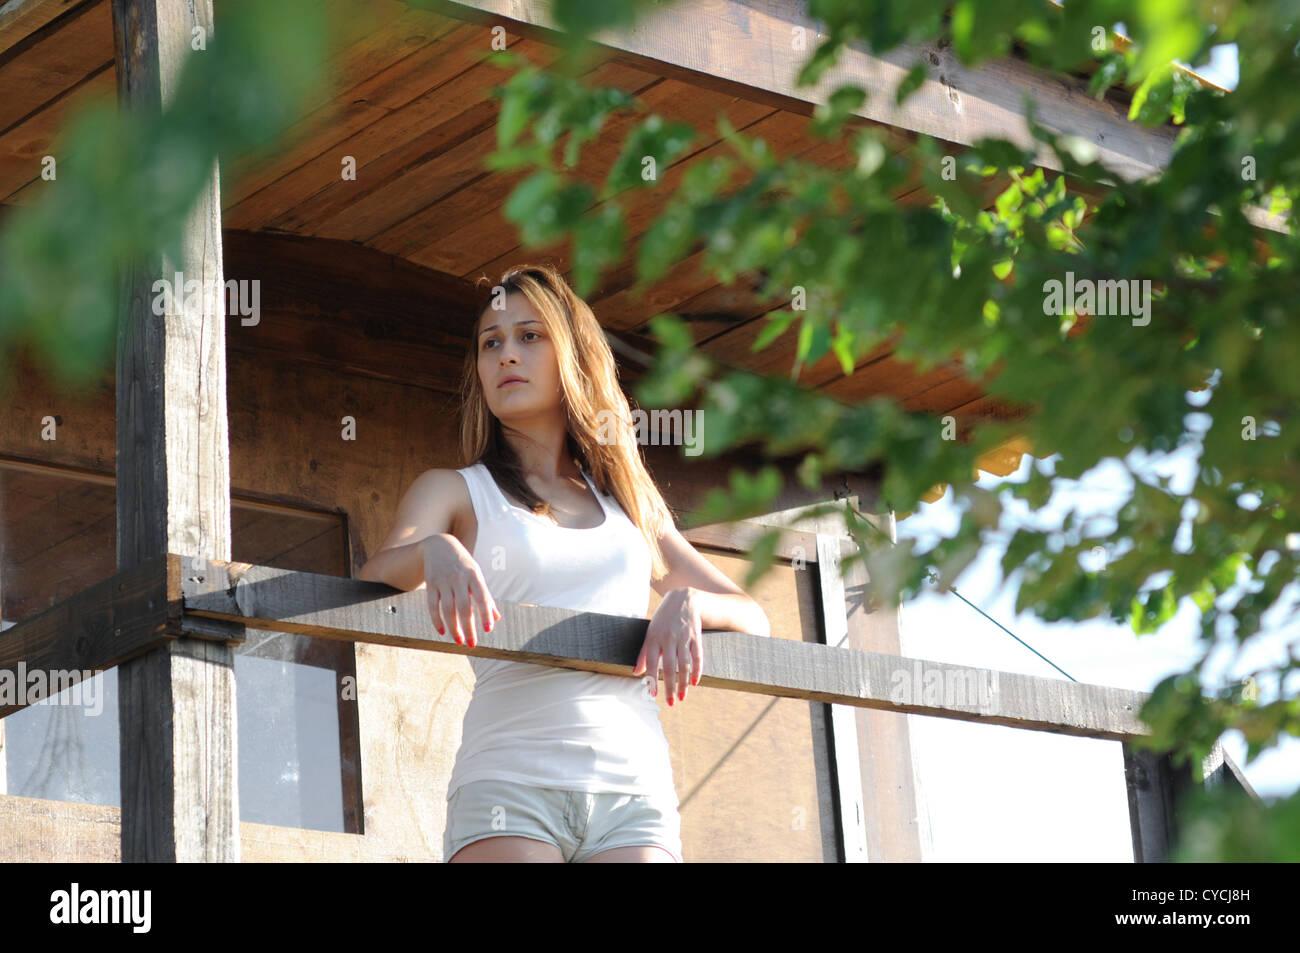 Frau auf dem Balkon eines Holzhauses. Stockbild